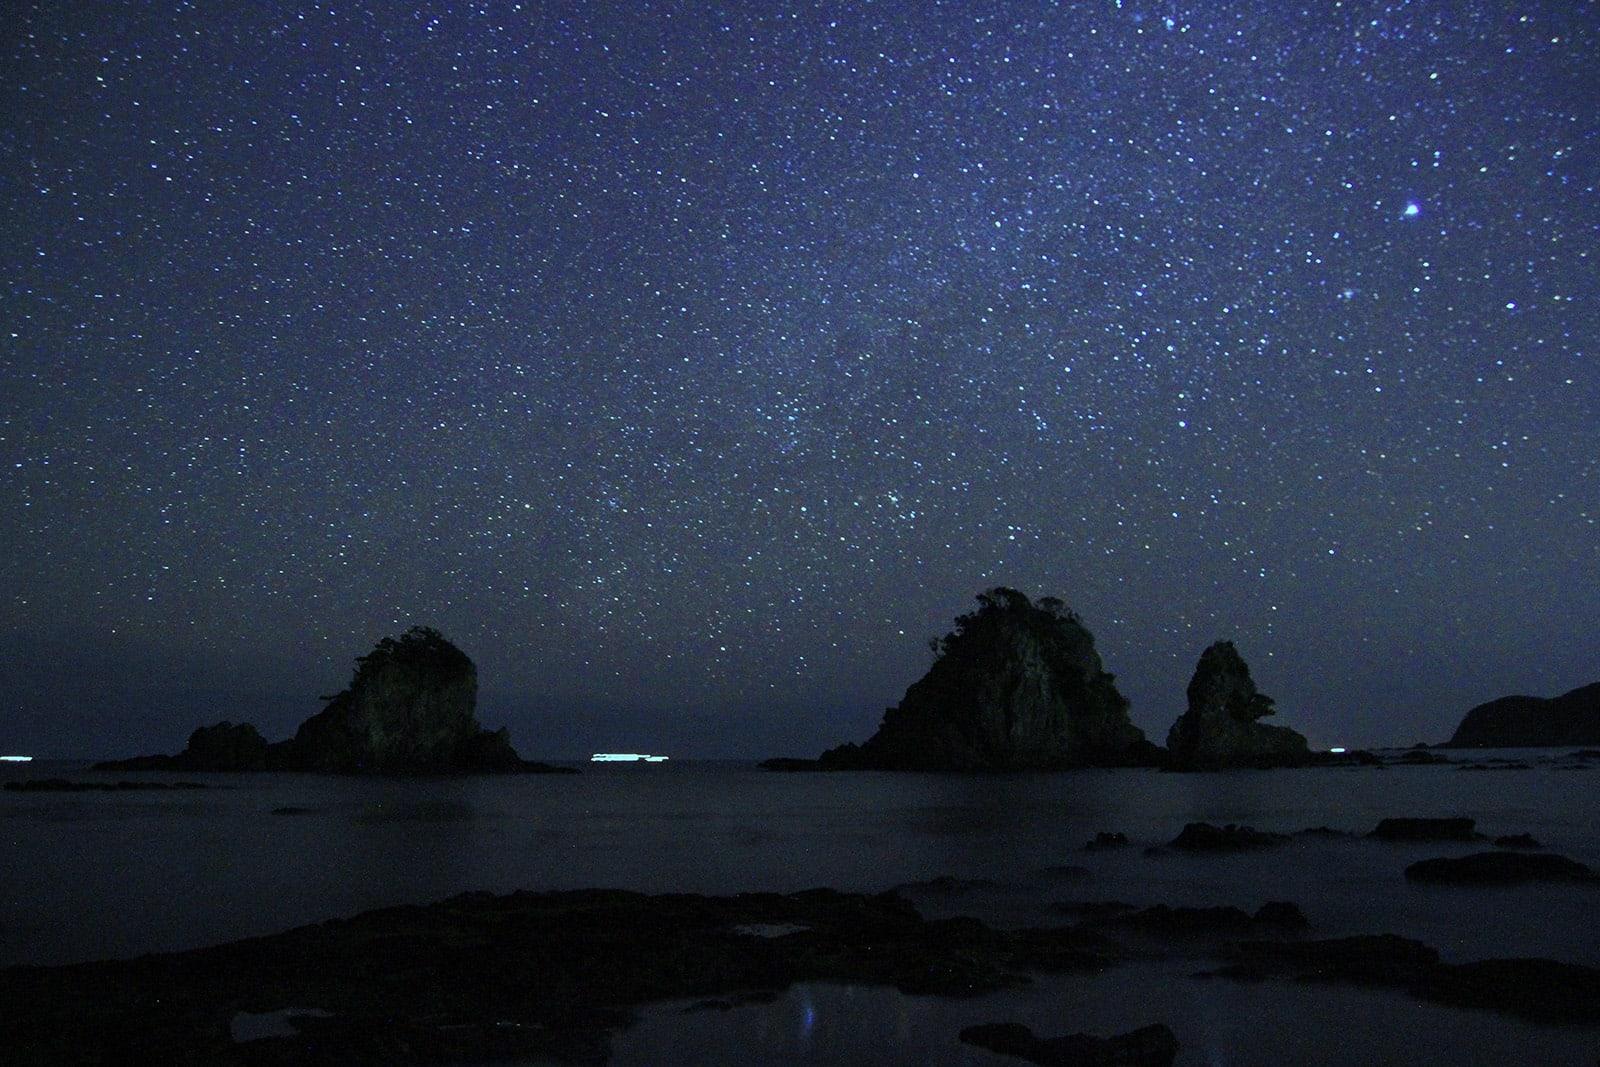 Ngắm Kawazu-zakura và trời sao tại Miurakaigan, Kanazawa-ken 12